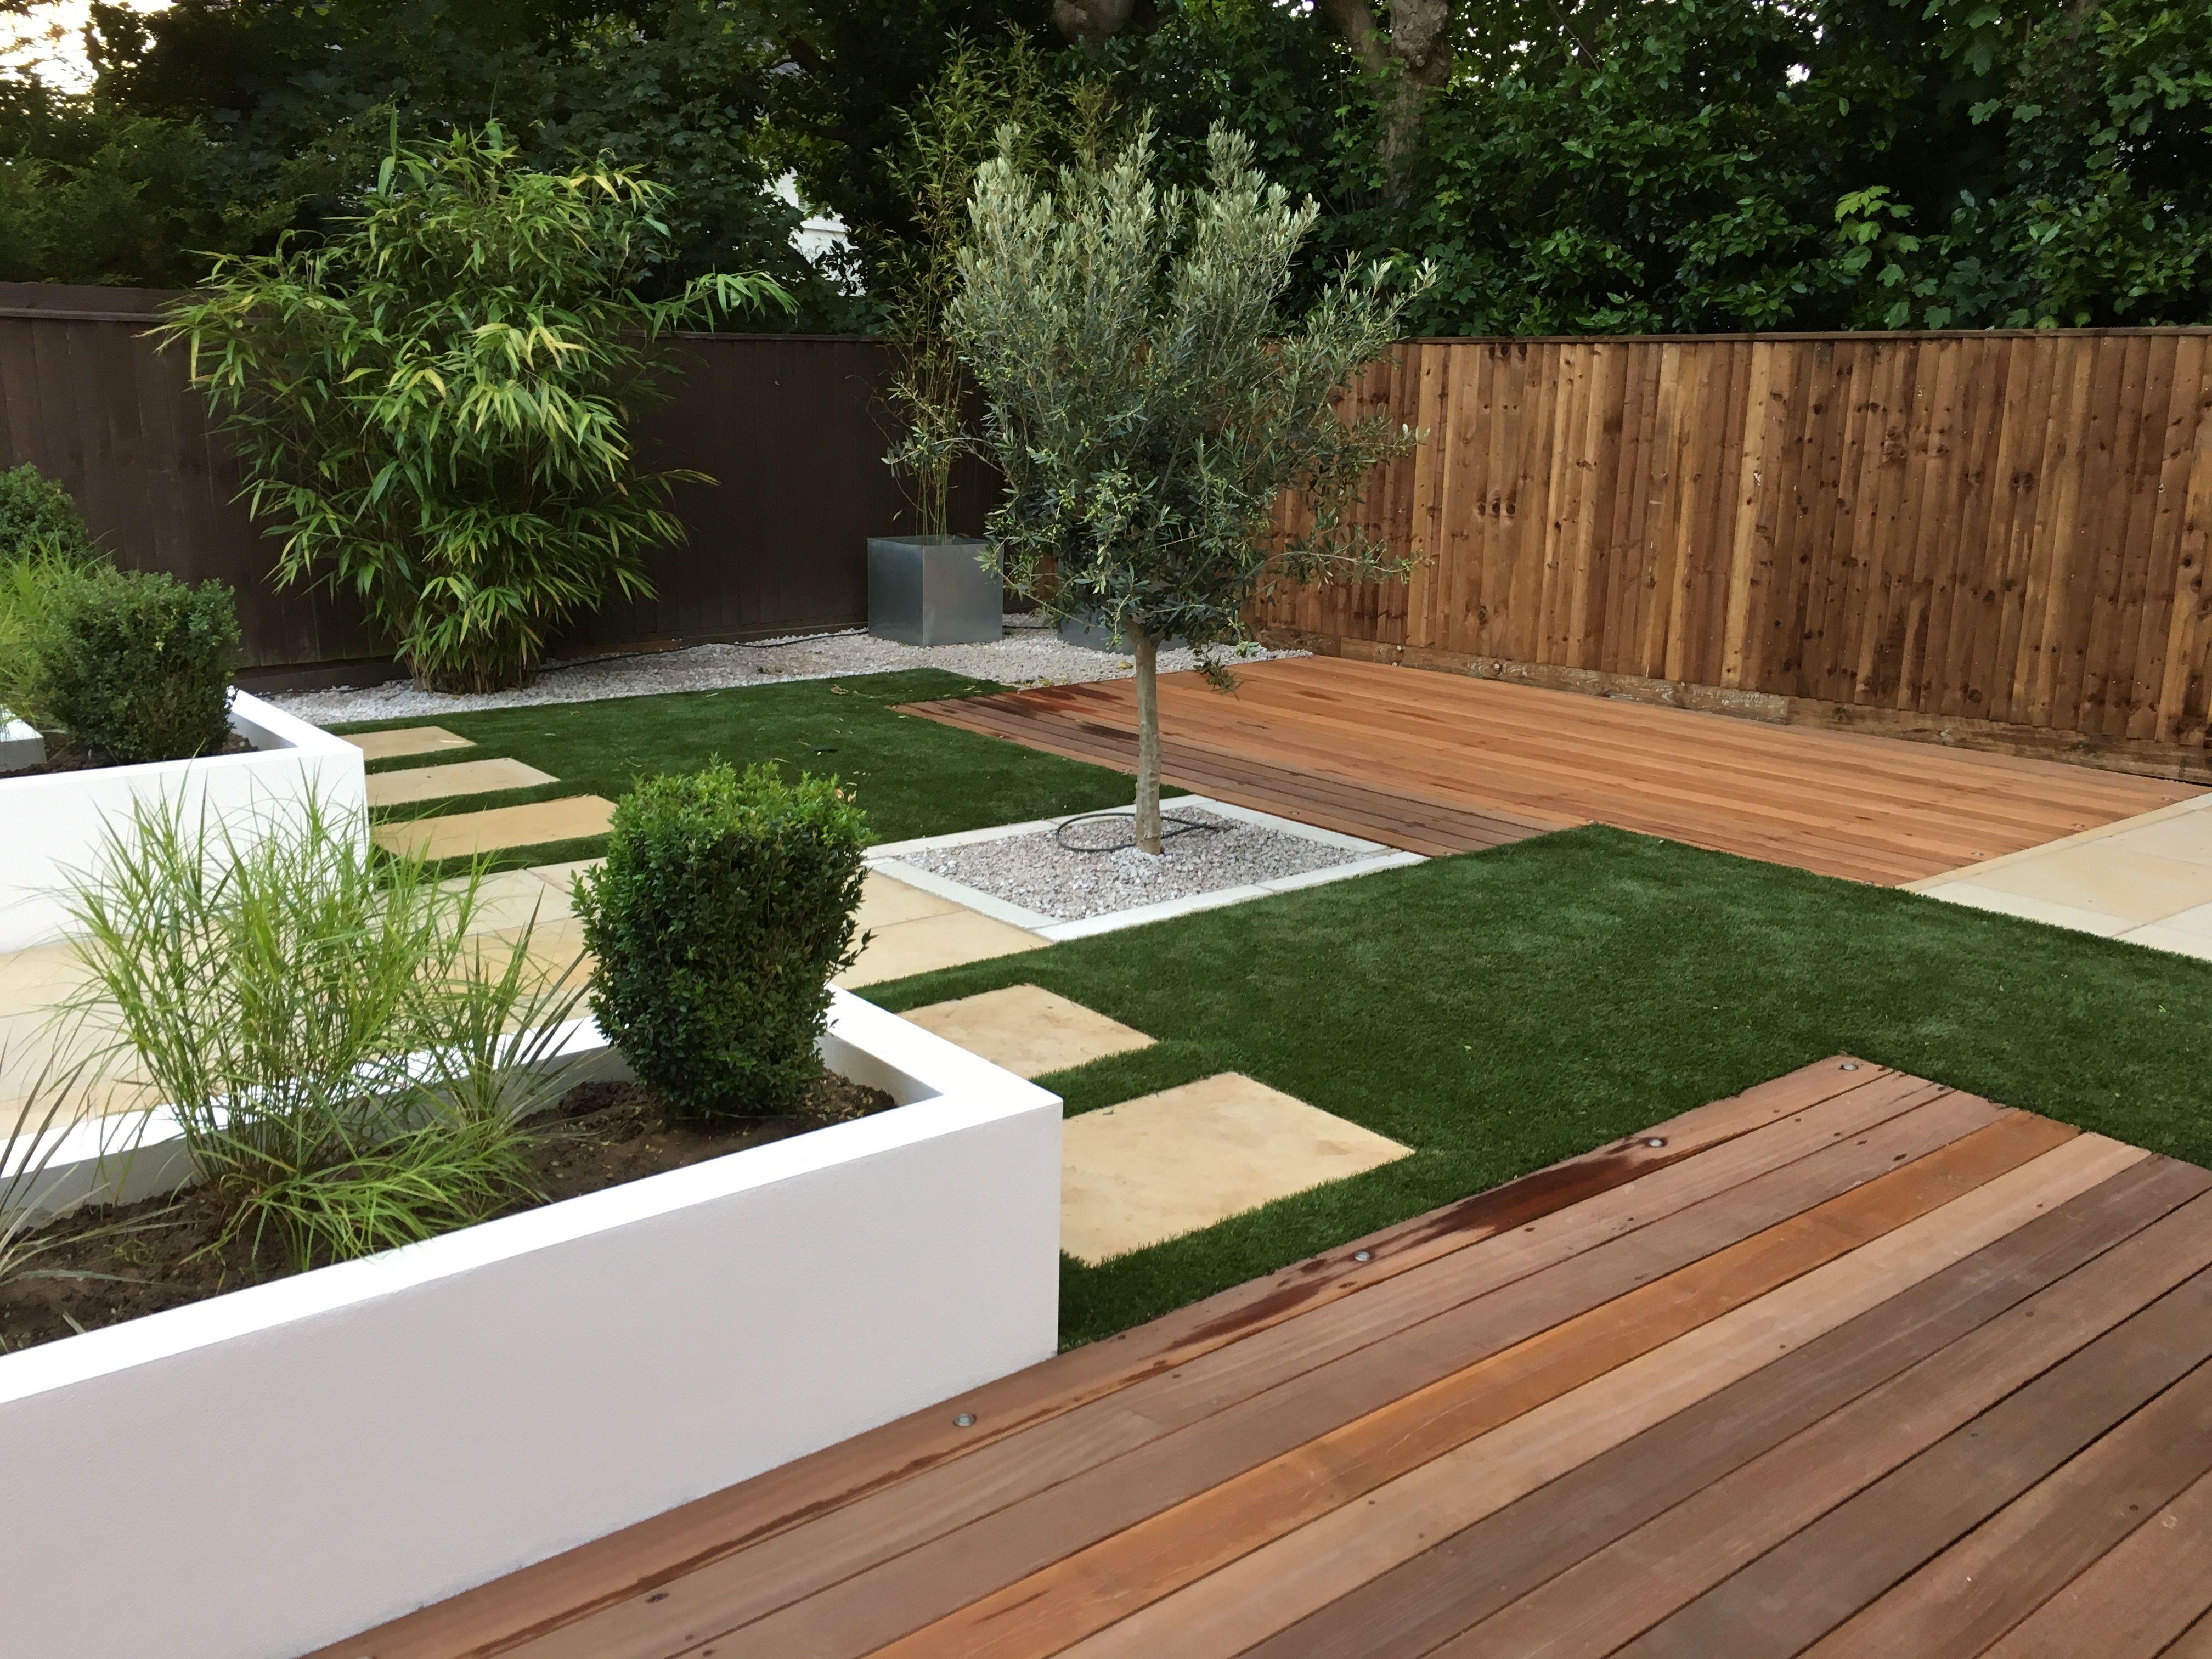 Our Ascot Uk Garden Design Build Greenbee Gardening Courtyard Gardens Design Backyard Patio Backyard